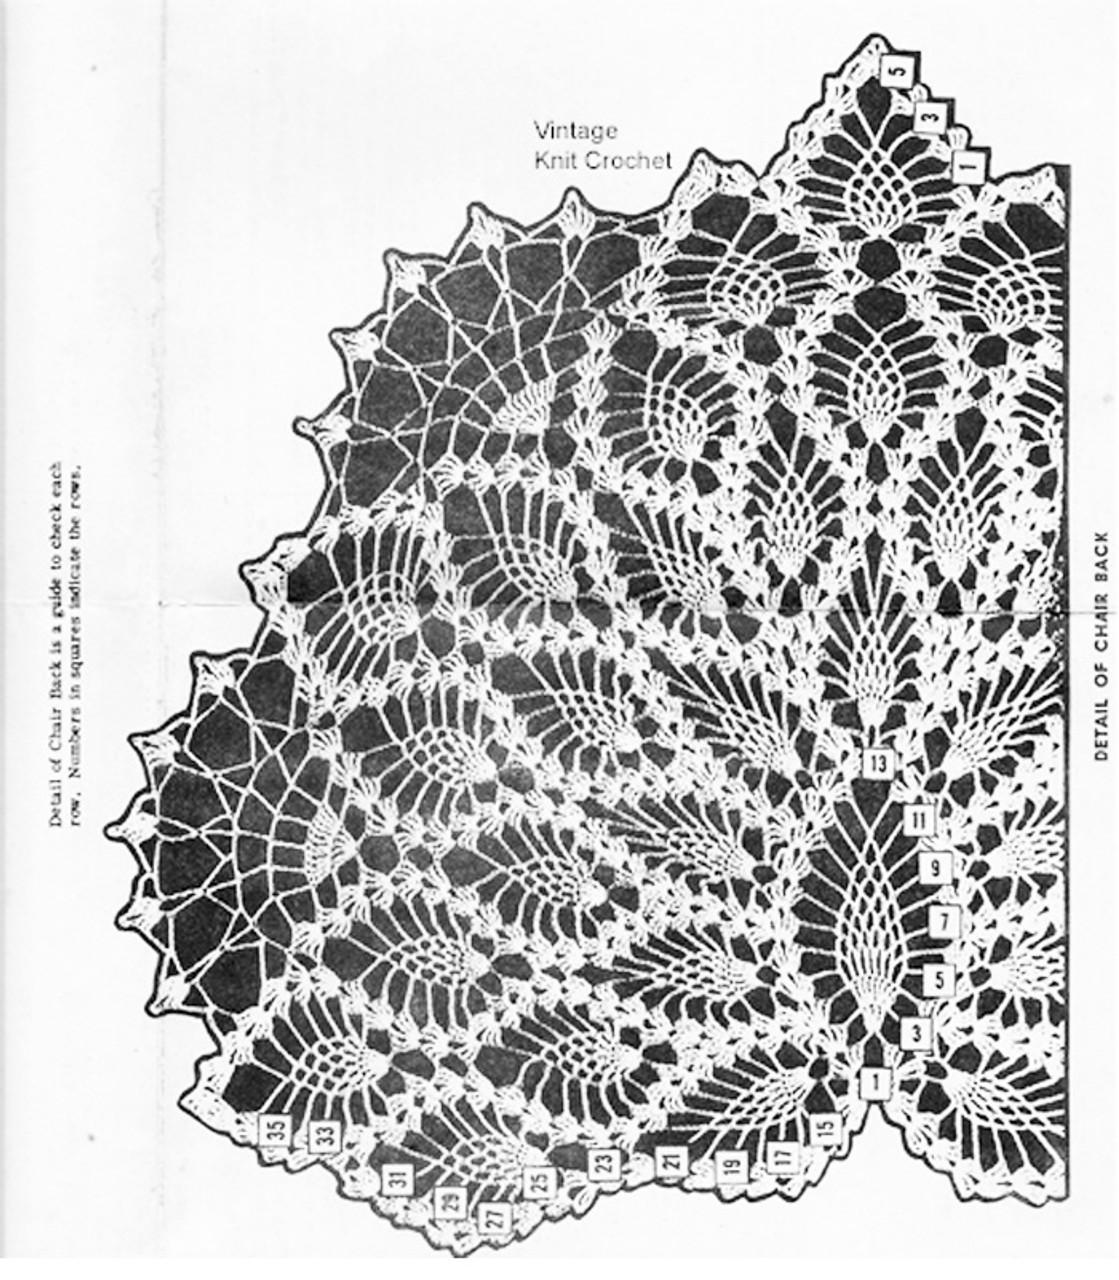 Pineapple Chair Set Pattern Stitch Illustration for Design 891